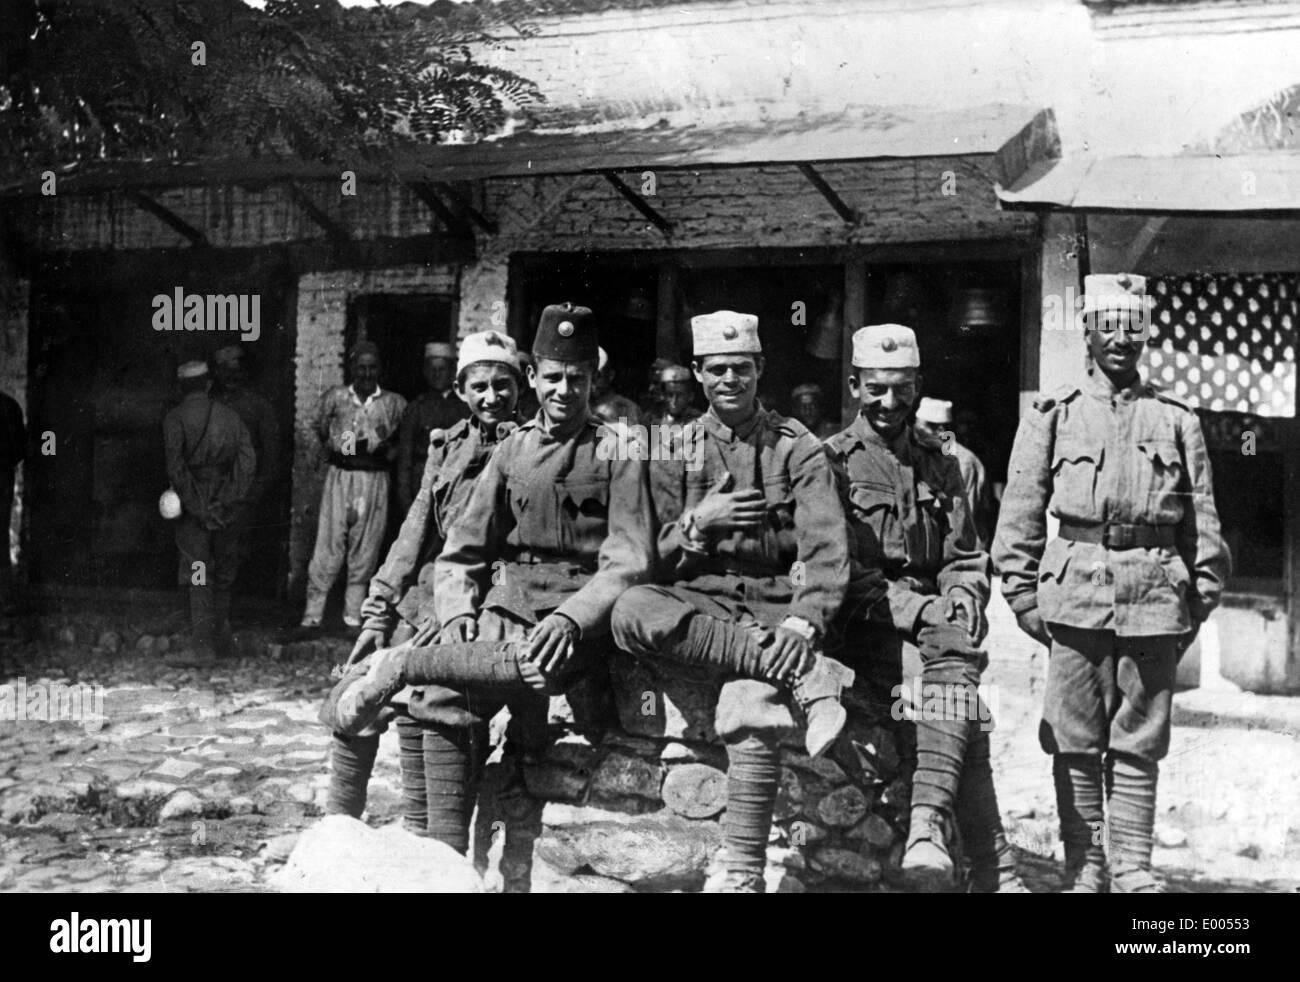 Albanian war volunteers in Tirana, 1917 - Stock Image